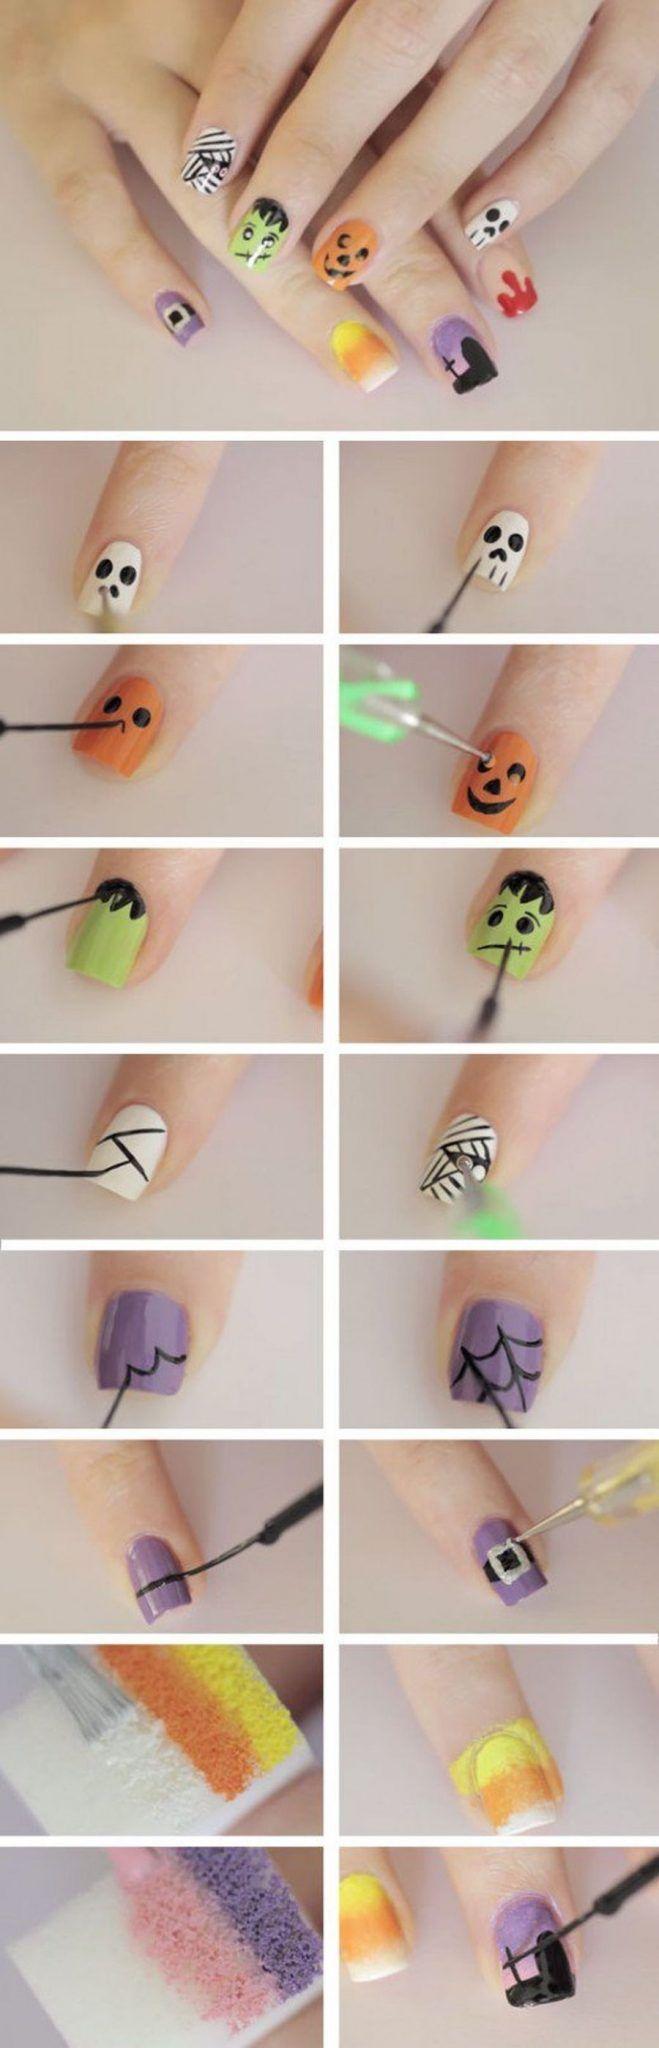 310 besten Makeups Ideas Bilder auf Pinterest | Nagelkunst, Beauty ...